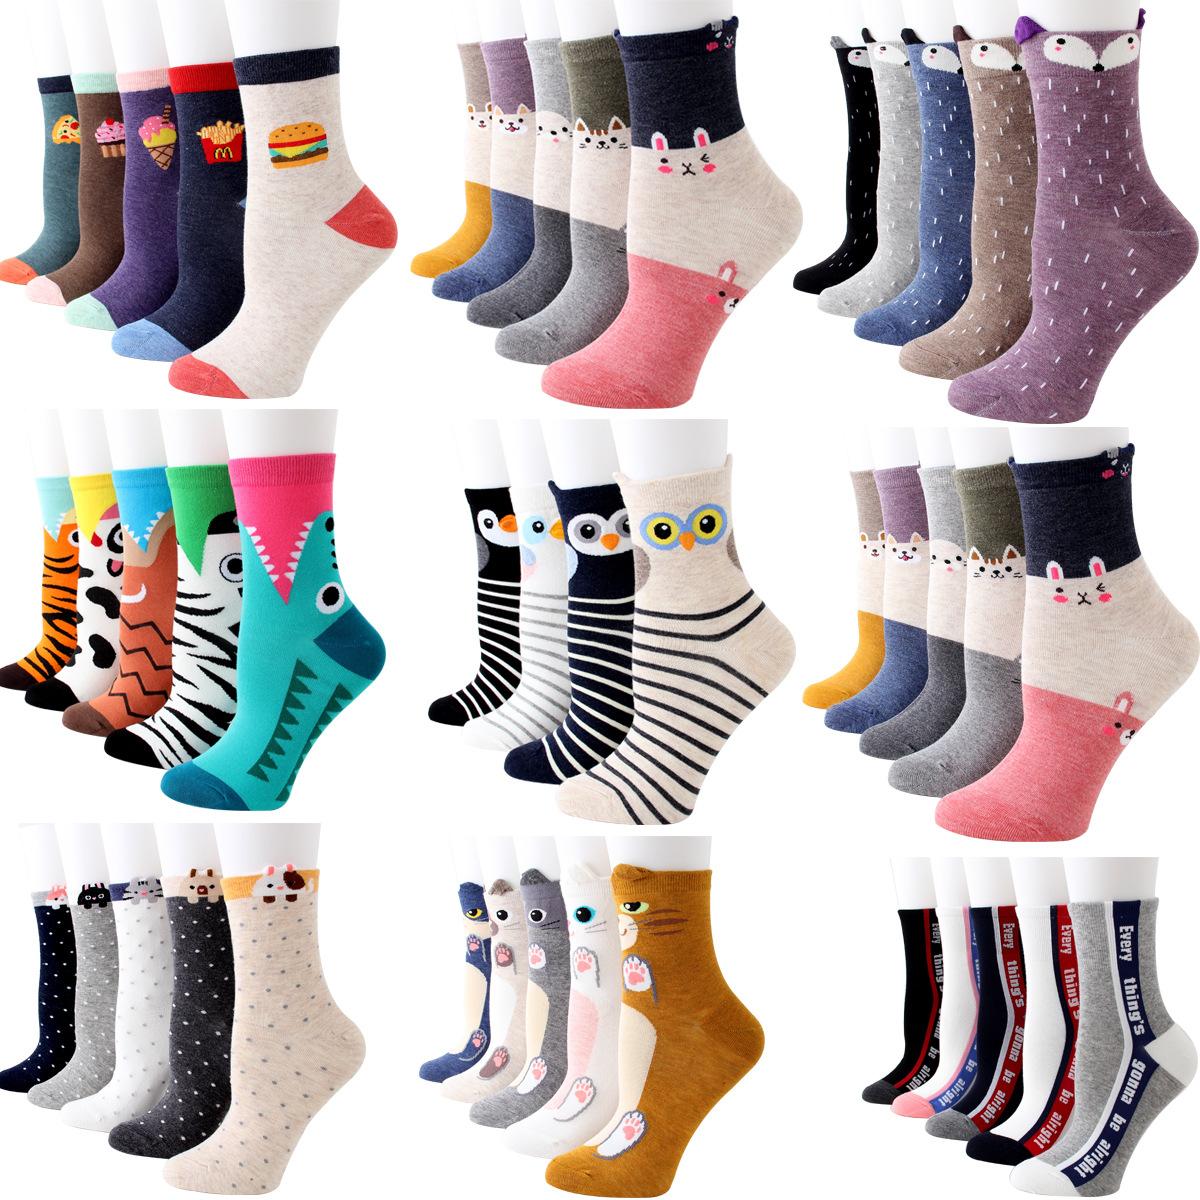 Cartoon Shiba Inu Dog Unisex Funny Casual Crew Socks Athletic Socks For Boys Girls Kids Teenagers